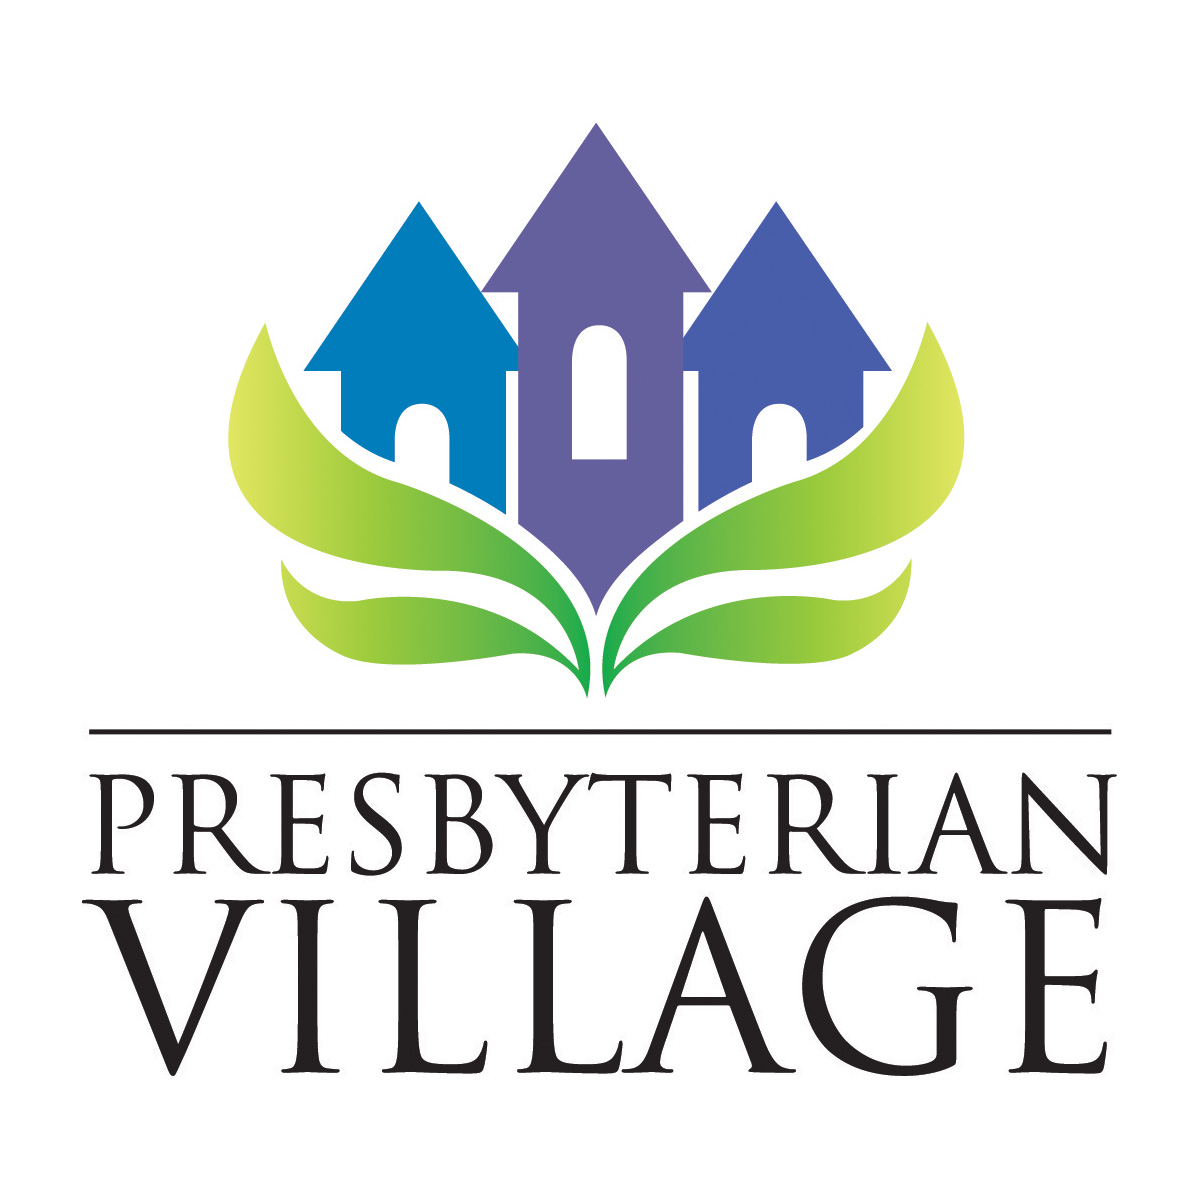 Presbyterian Village